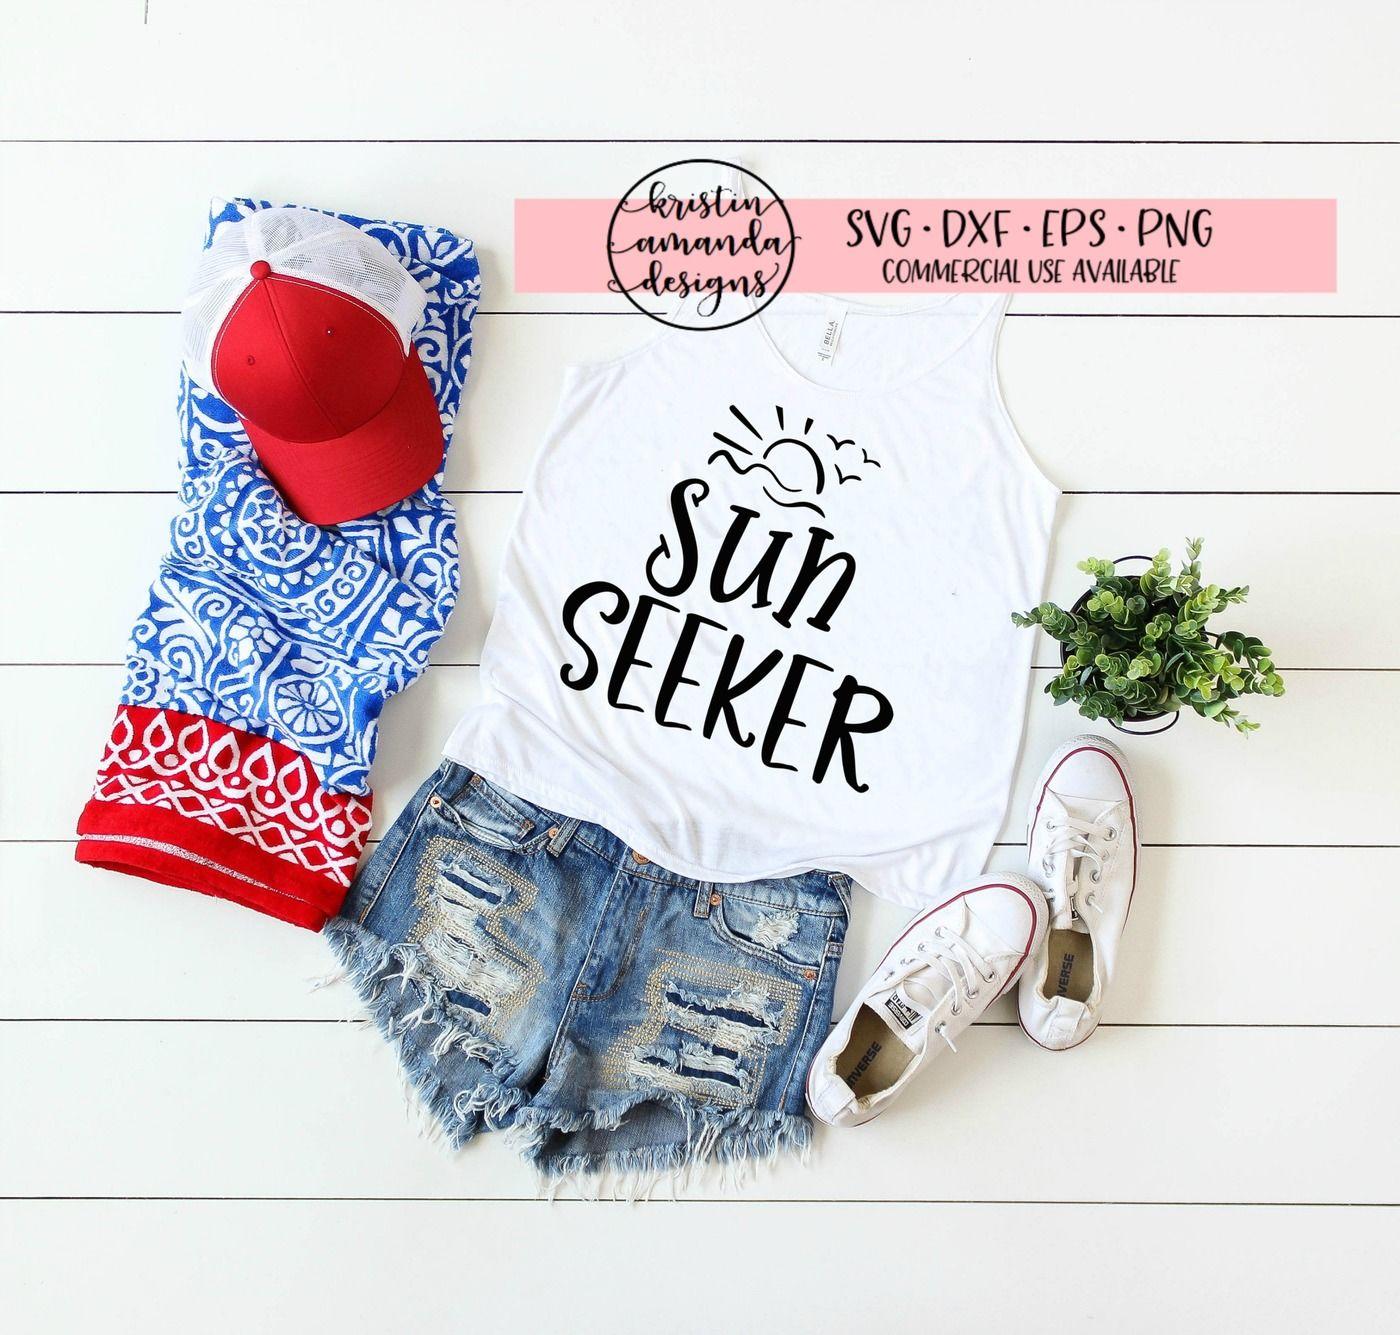 Sun Seeker Summer Svg Dxf Eps Png Cut File Cricut Silhouette